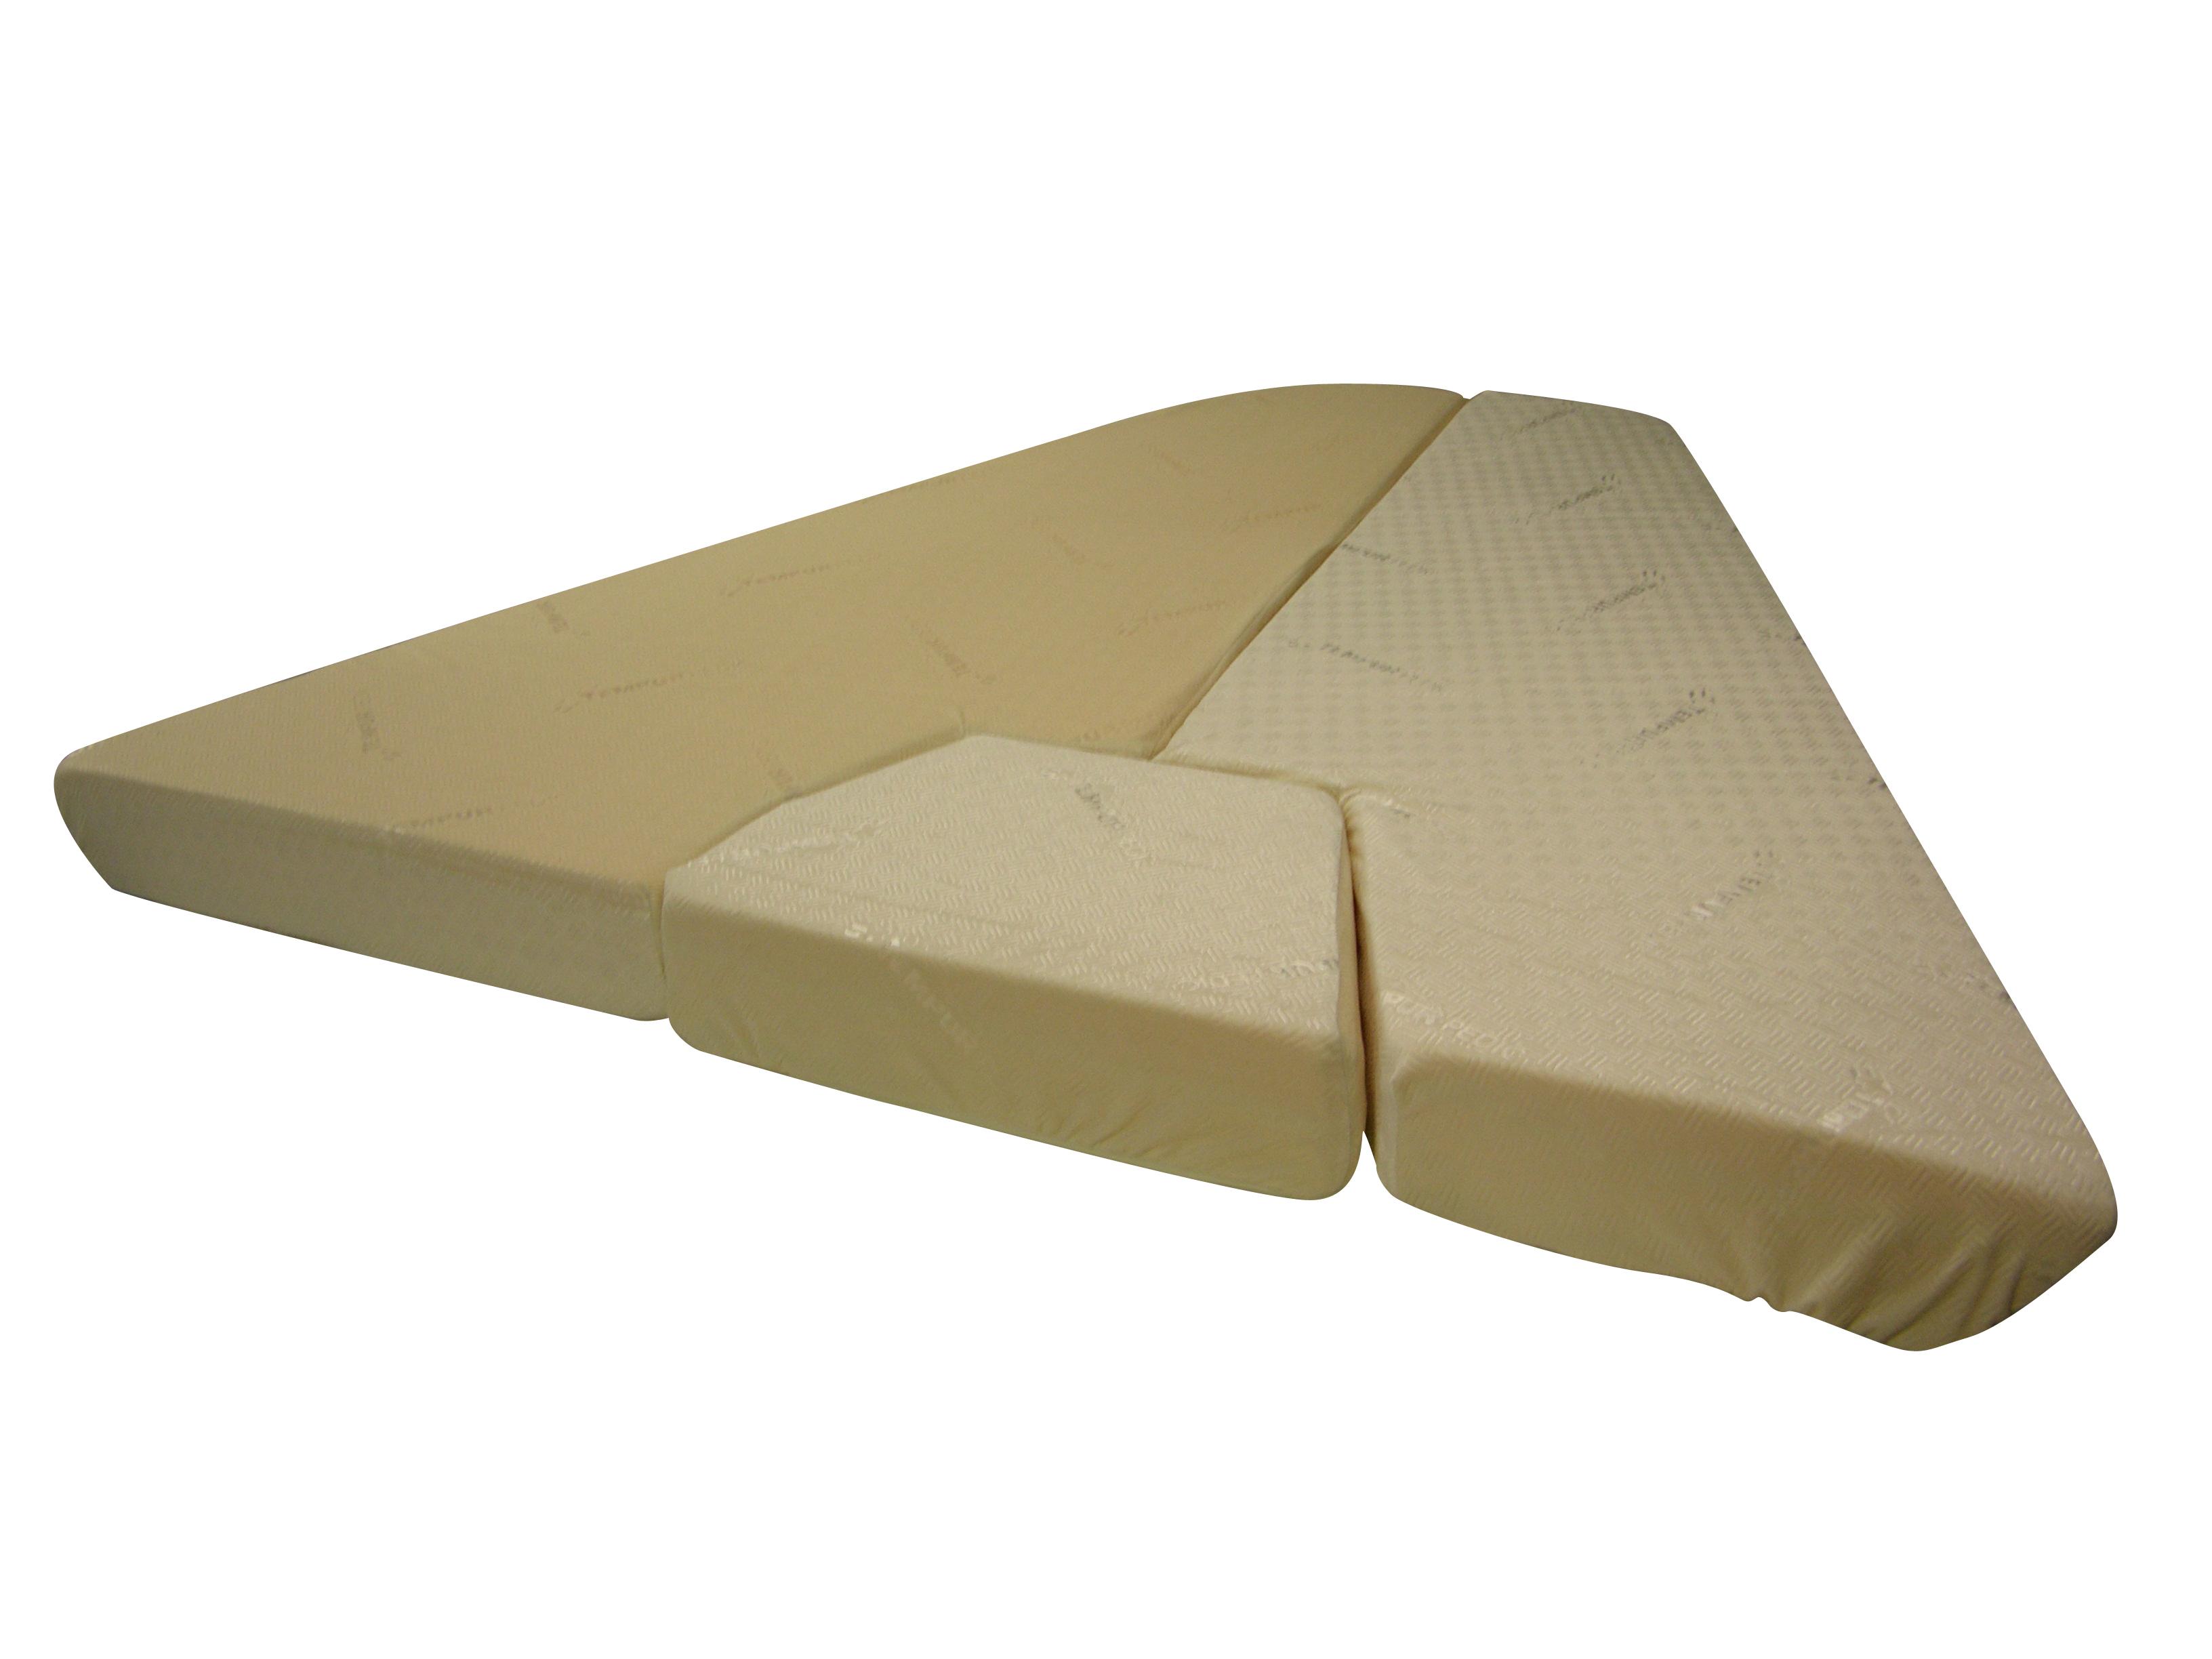 V-Berth mattress